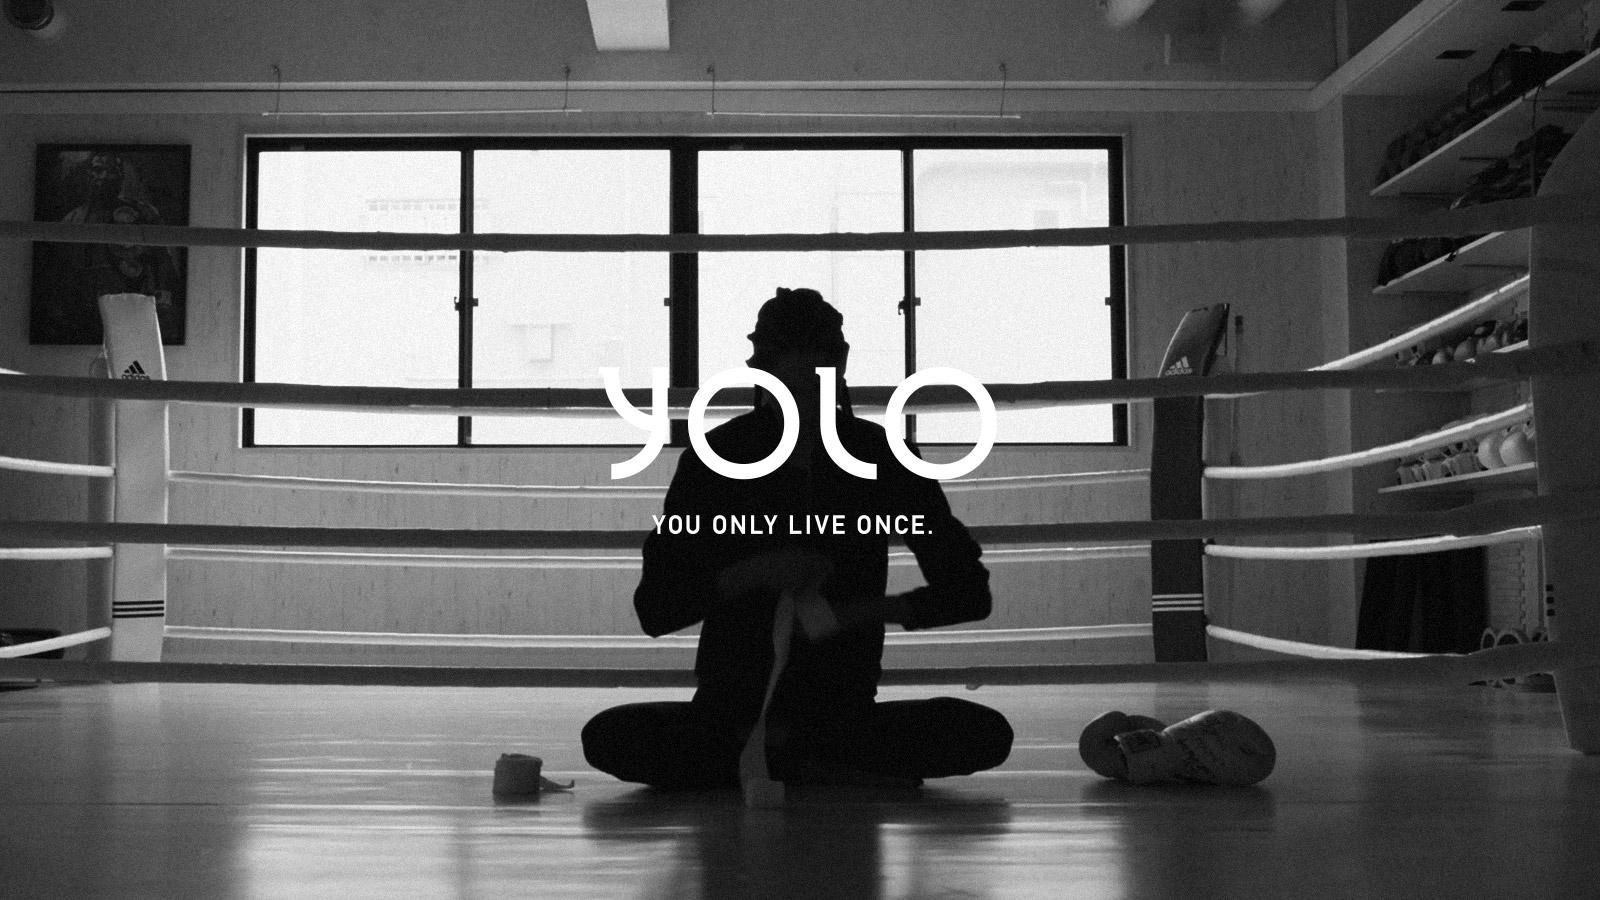 YOLO MAGAZINE WEB PROMOTION MOVIE Featuring KELLY